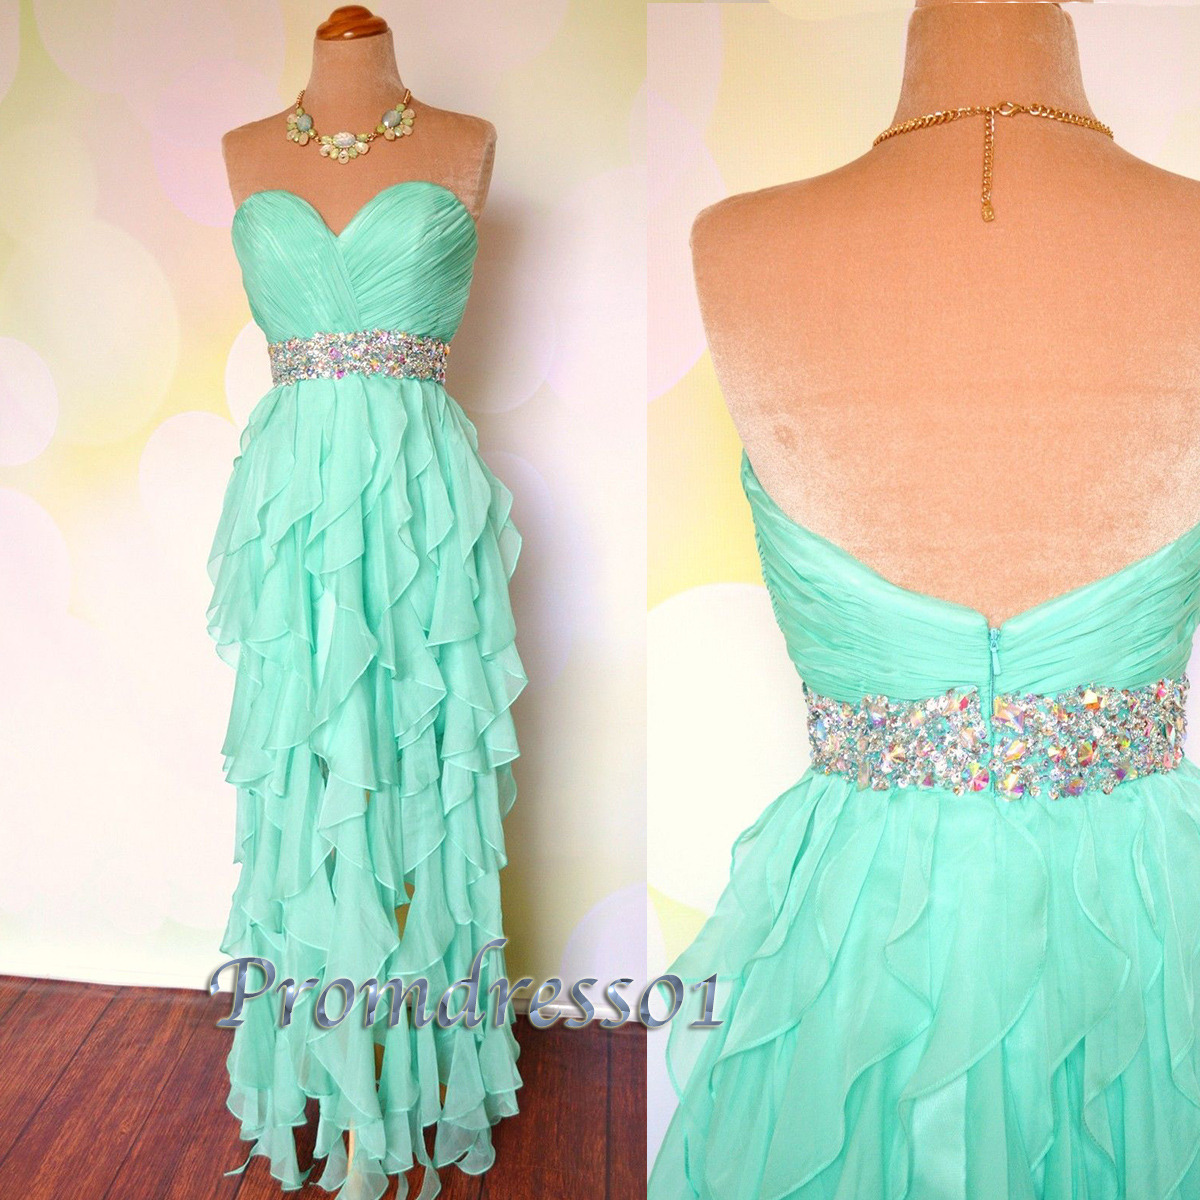 Are mistaken. green teen dresses